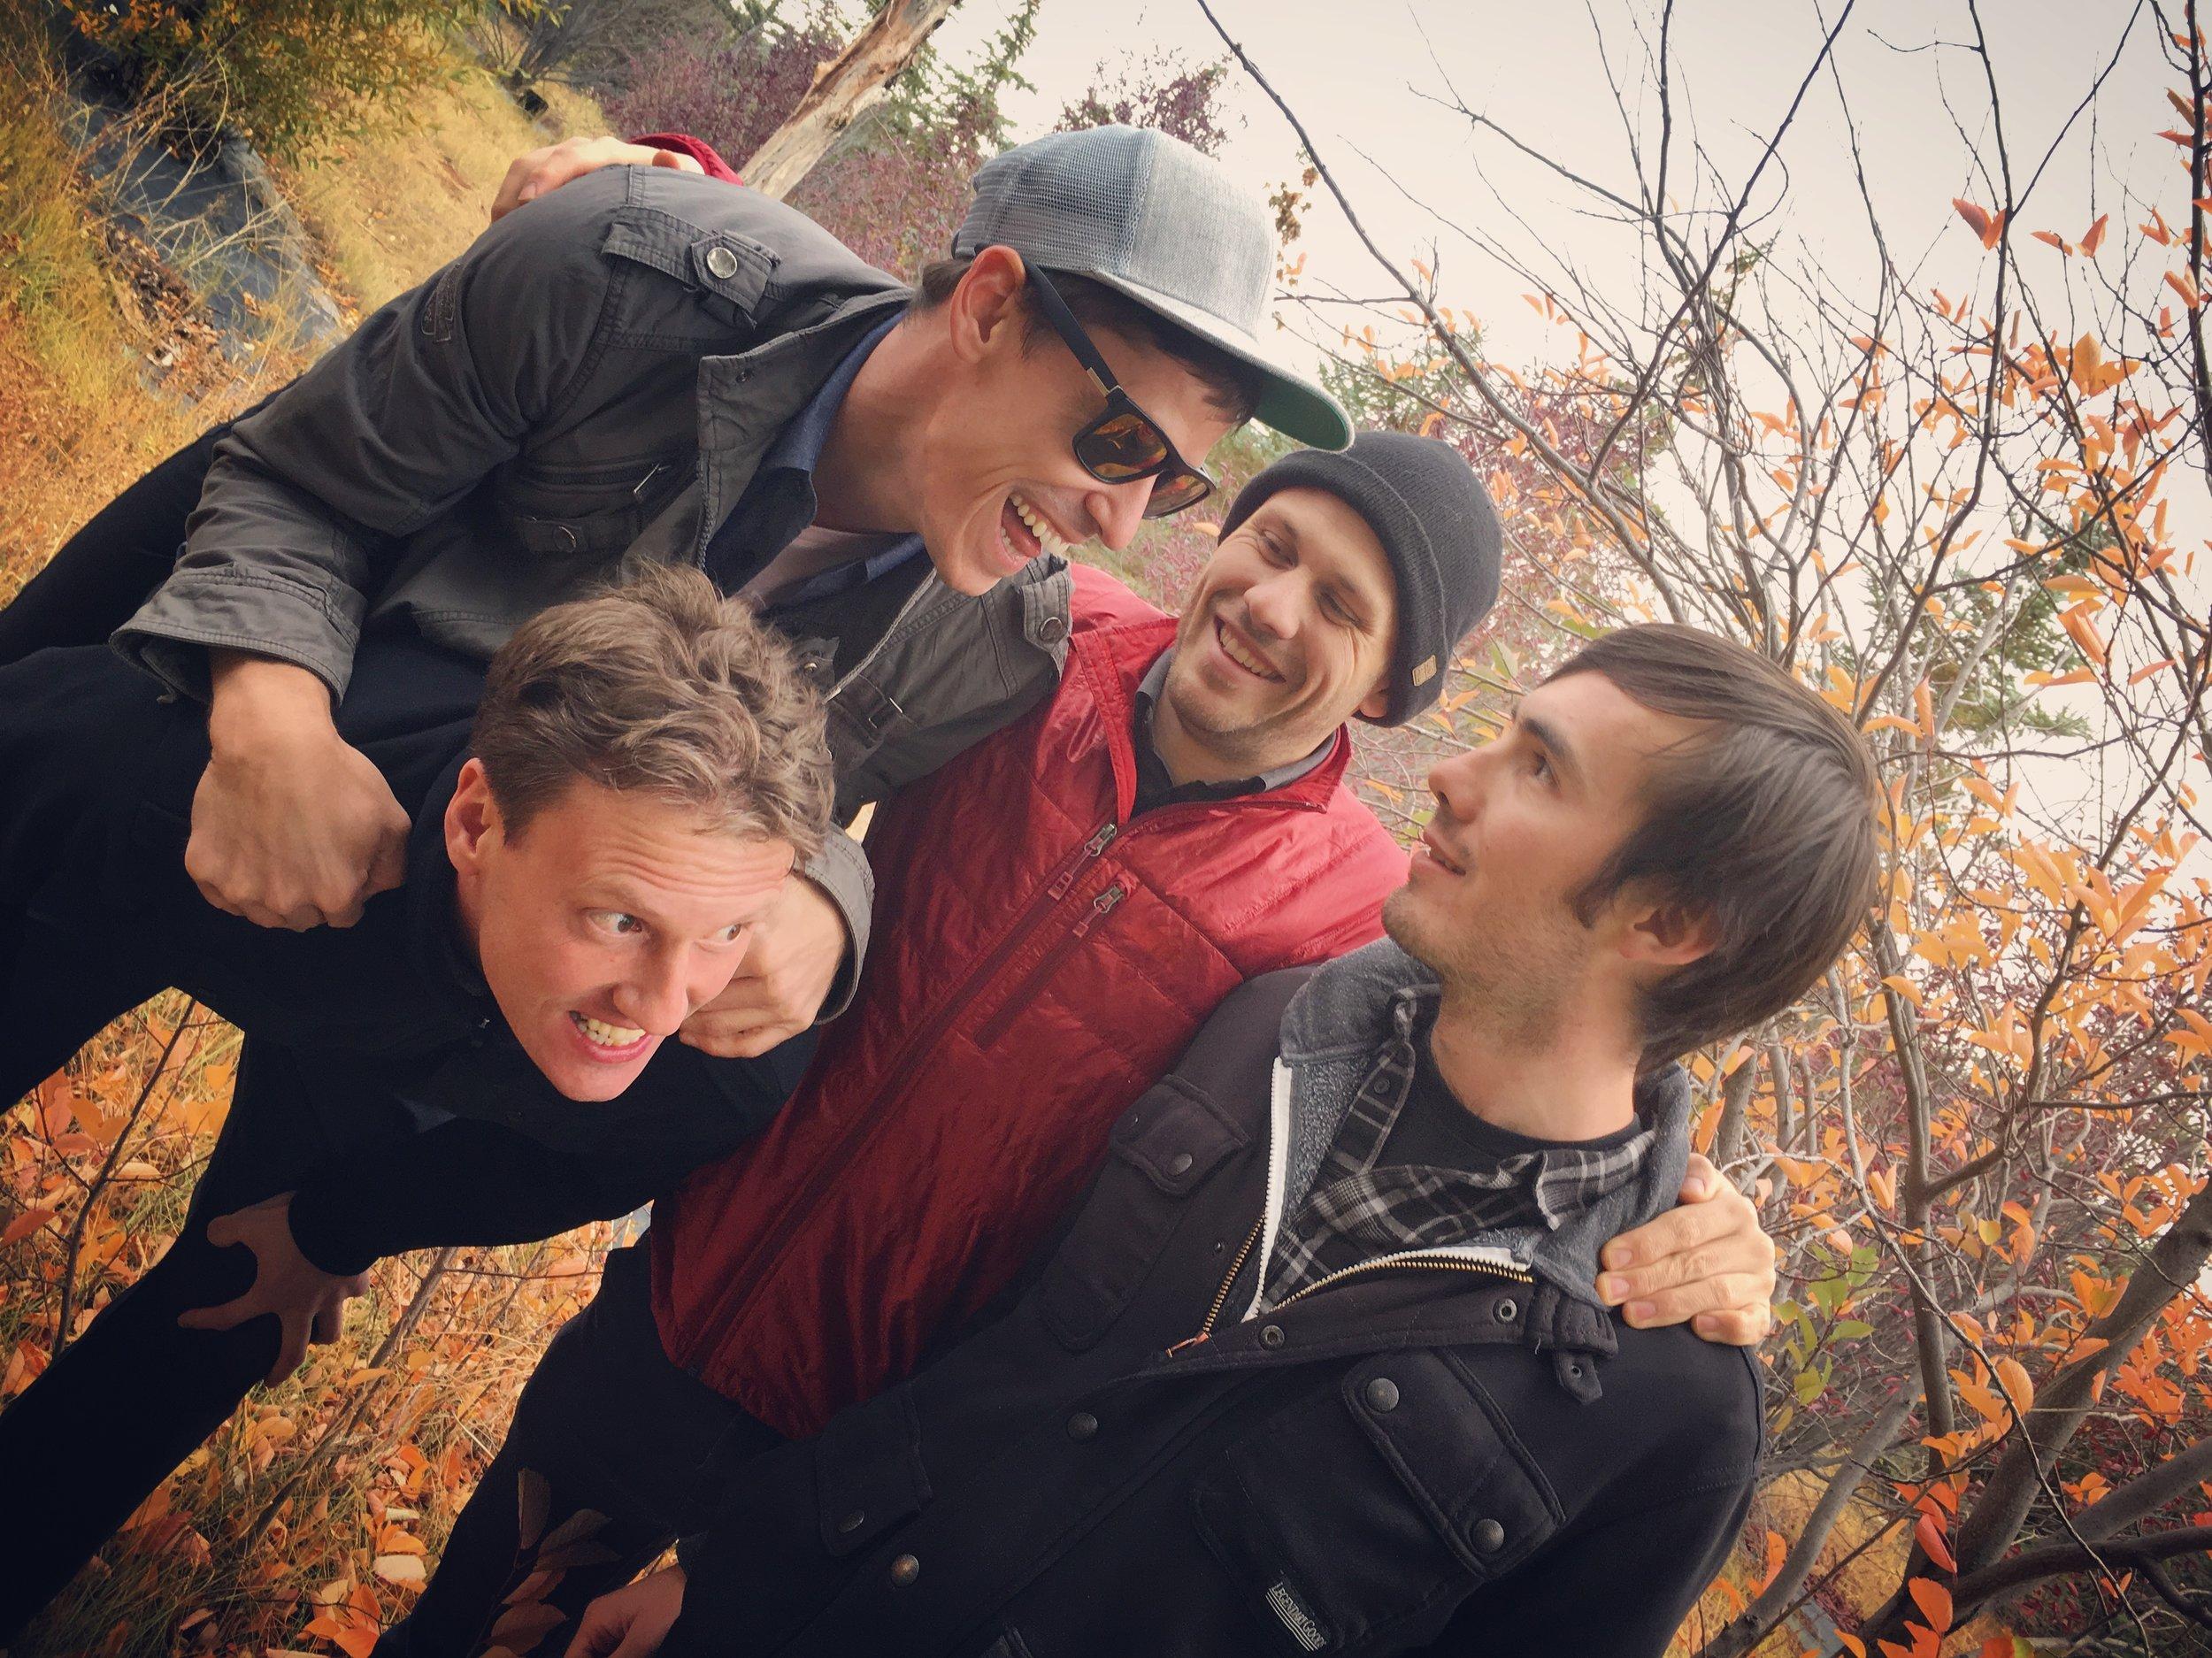 Andy Hackbarth Band 2016 PROMO 2.JPG